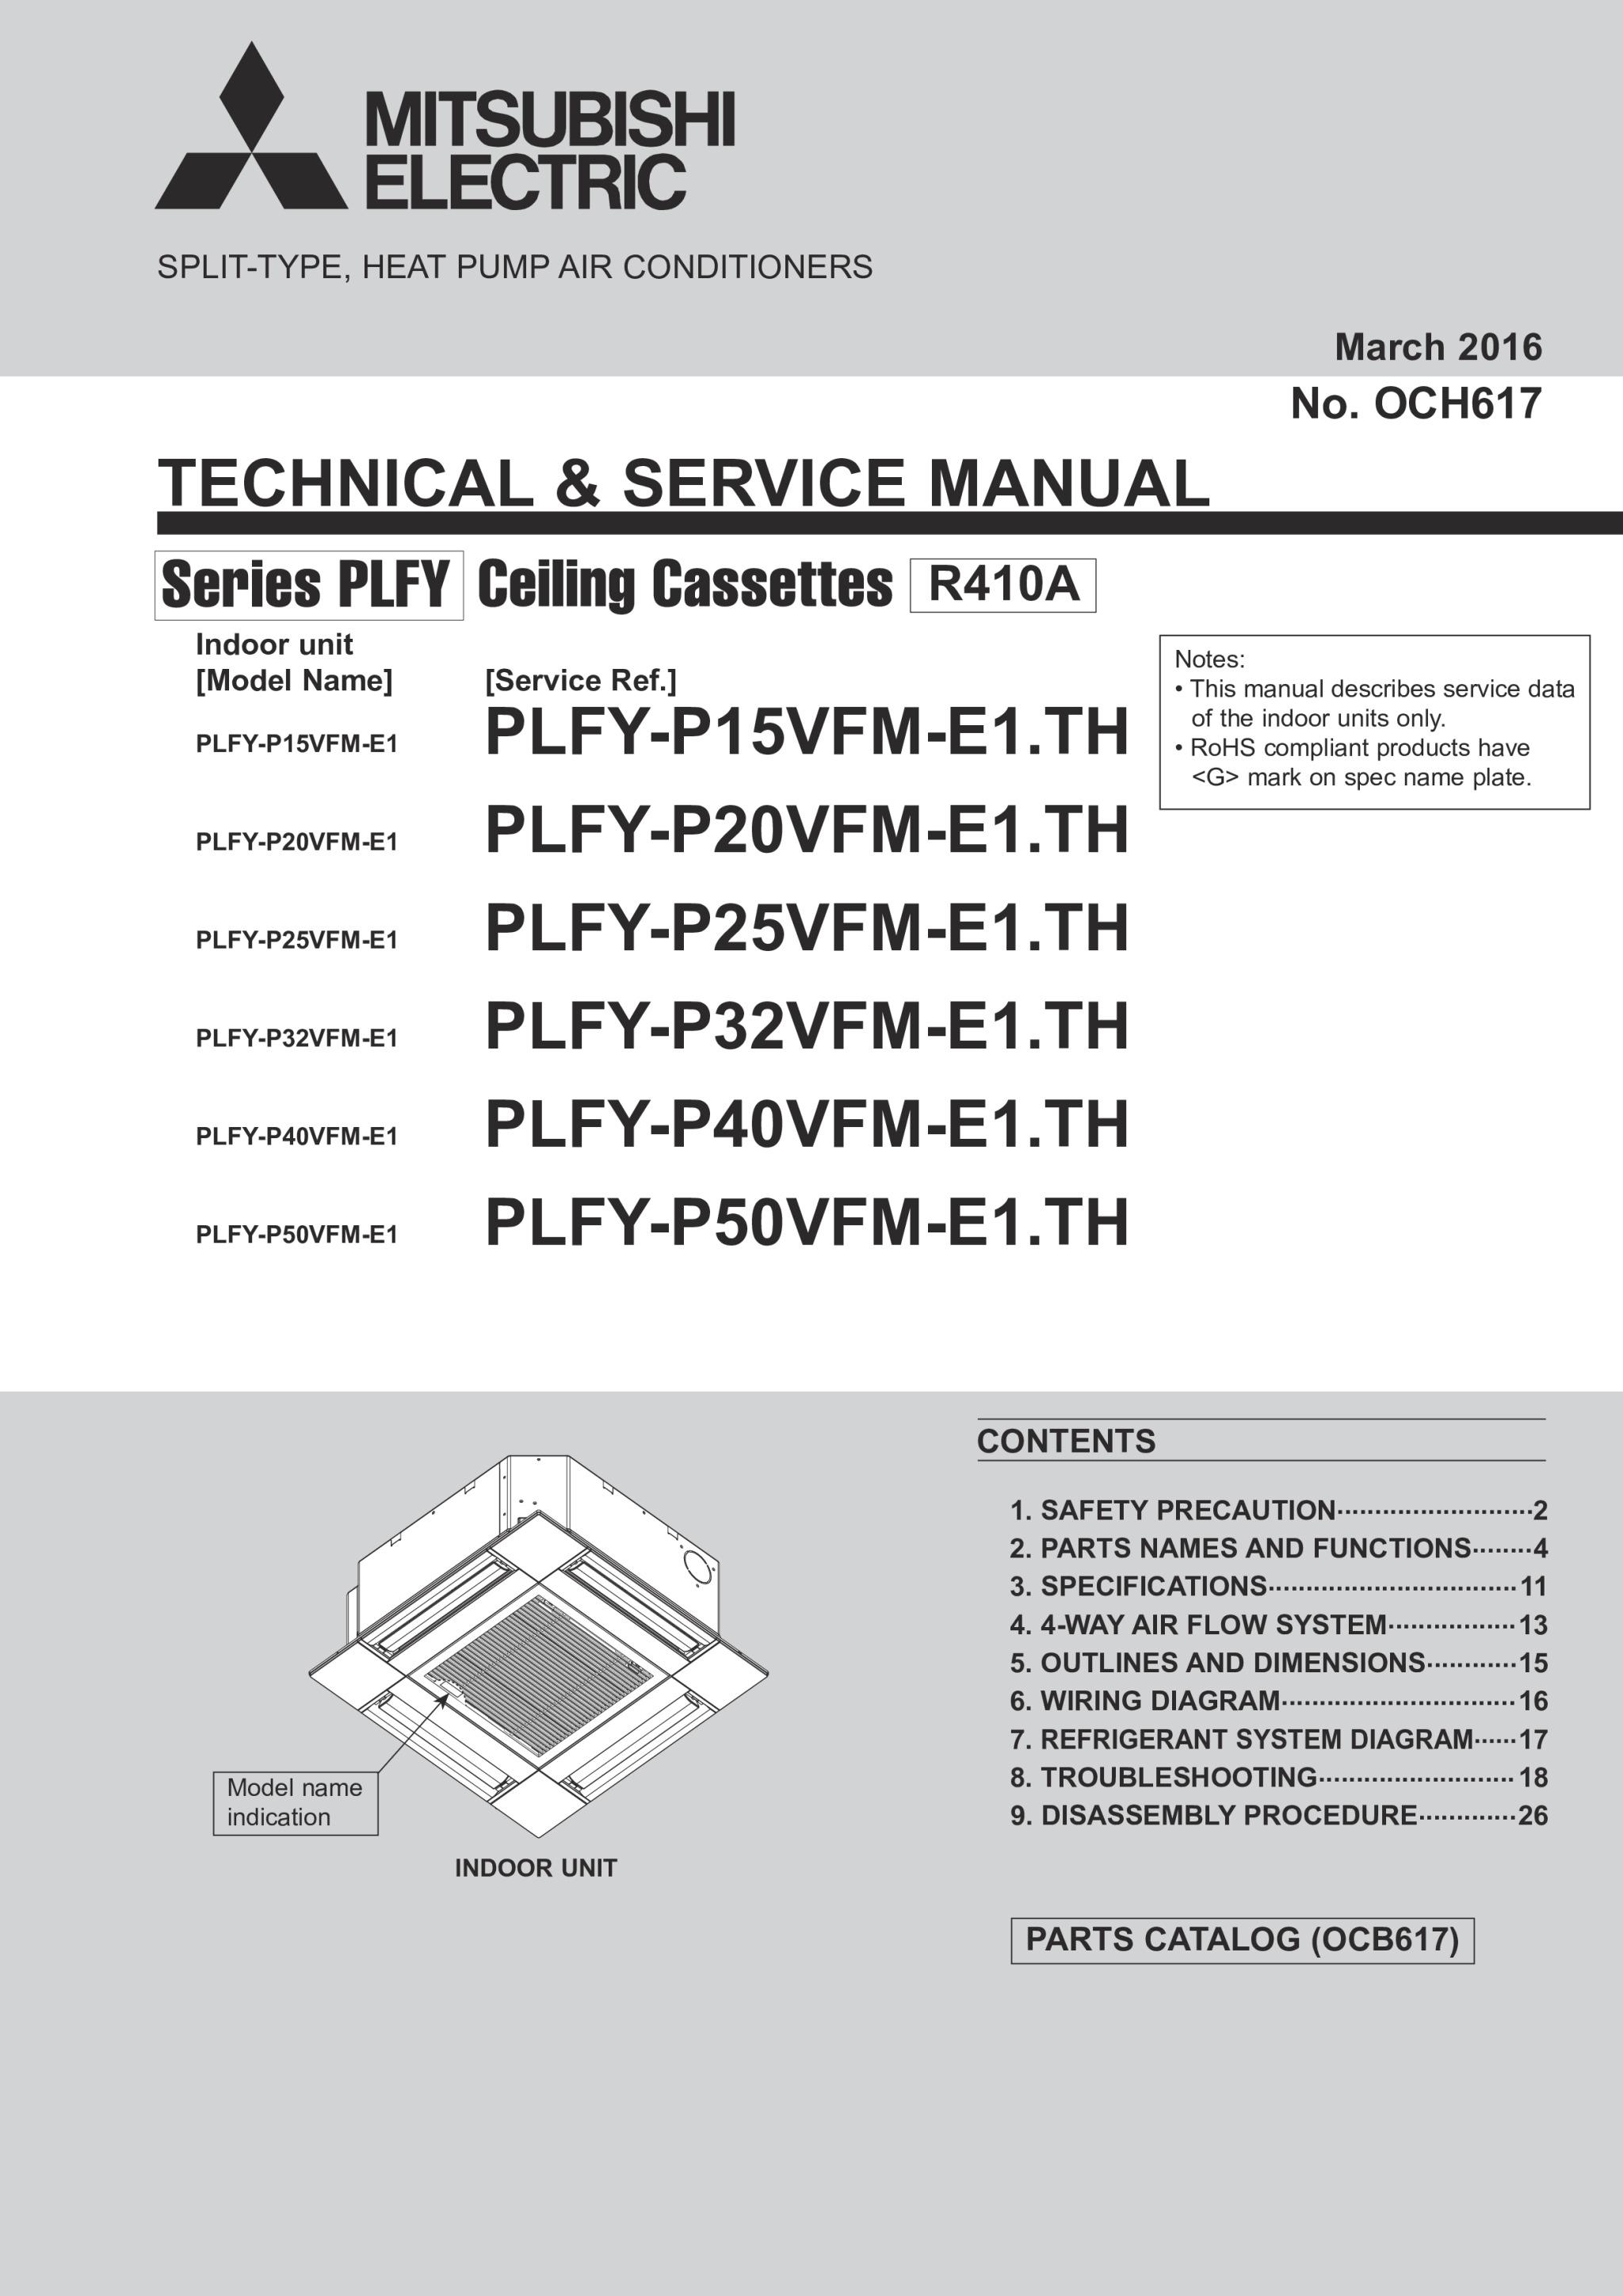 p15 wiring diagram custom wiring diagram u2022 rh littlewaves co Automotive Wiring Diagrams 3-Way Switch Wiring Diagram